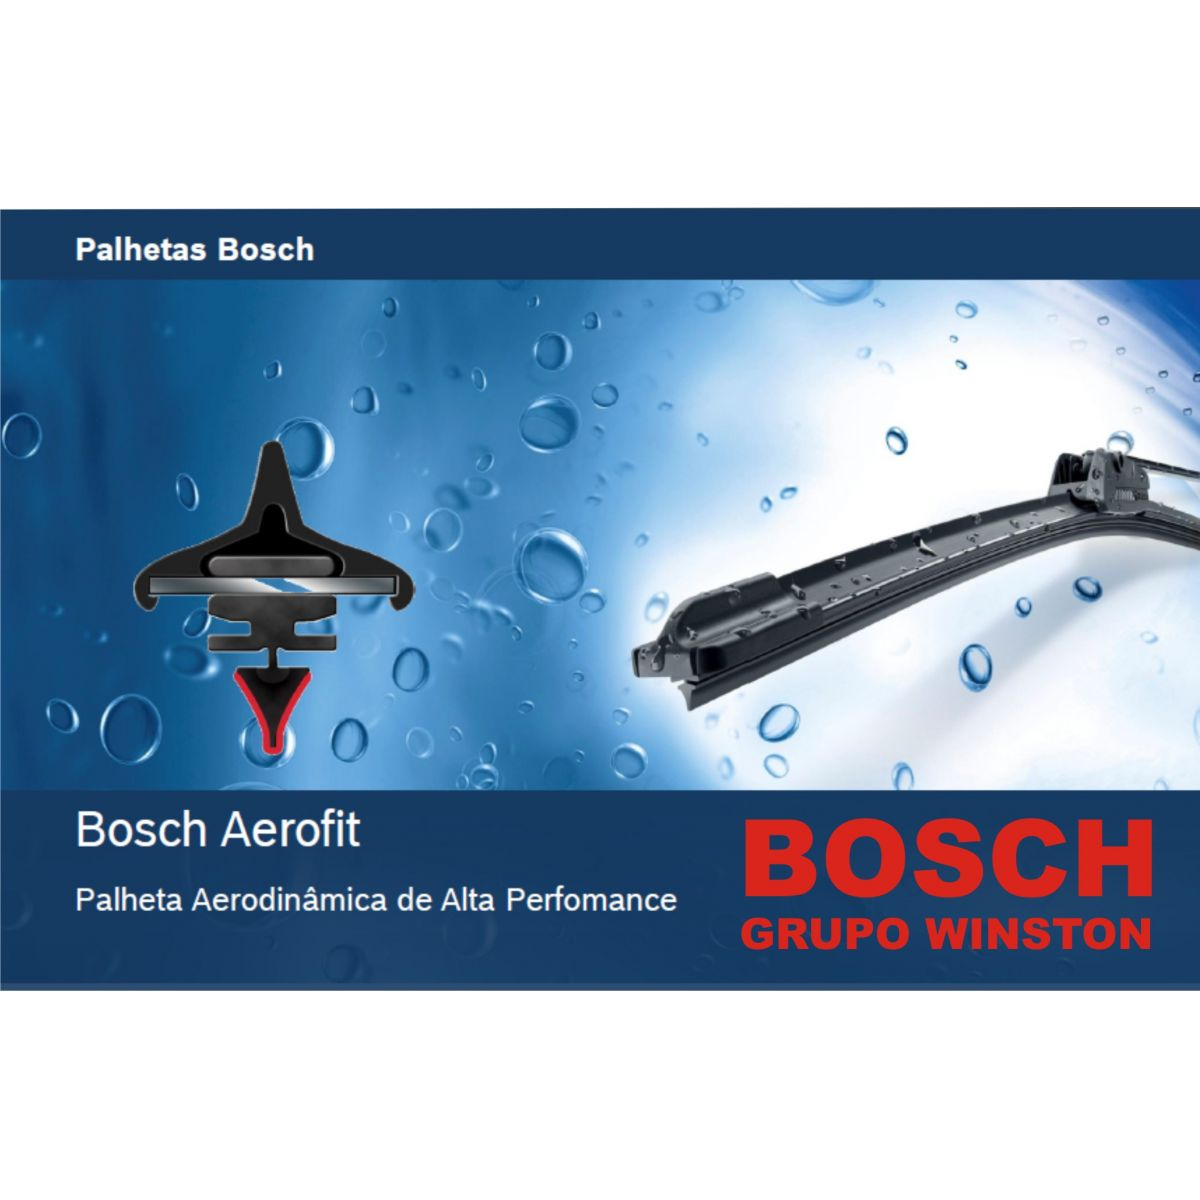 Palheta Bosch Aerofit Limpador de para brisa Bosch KIA Besta